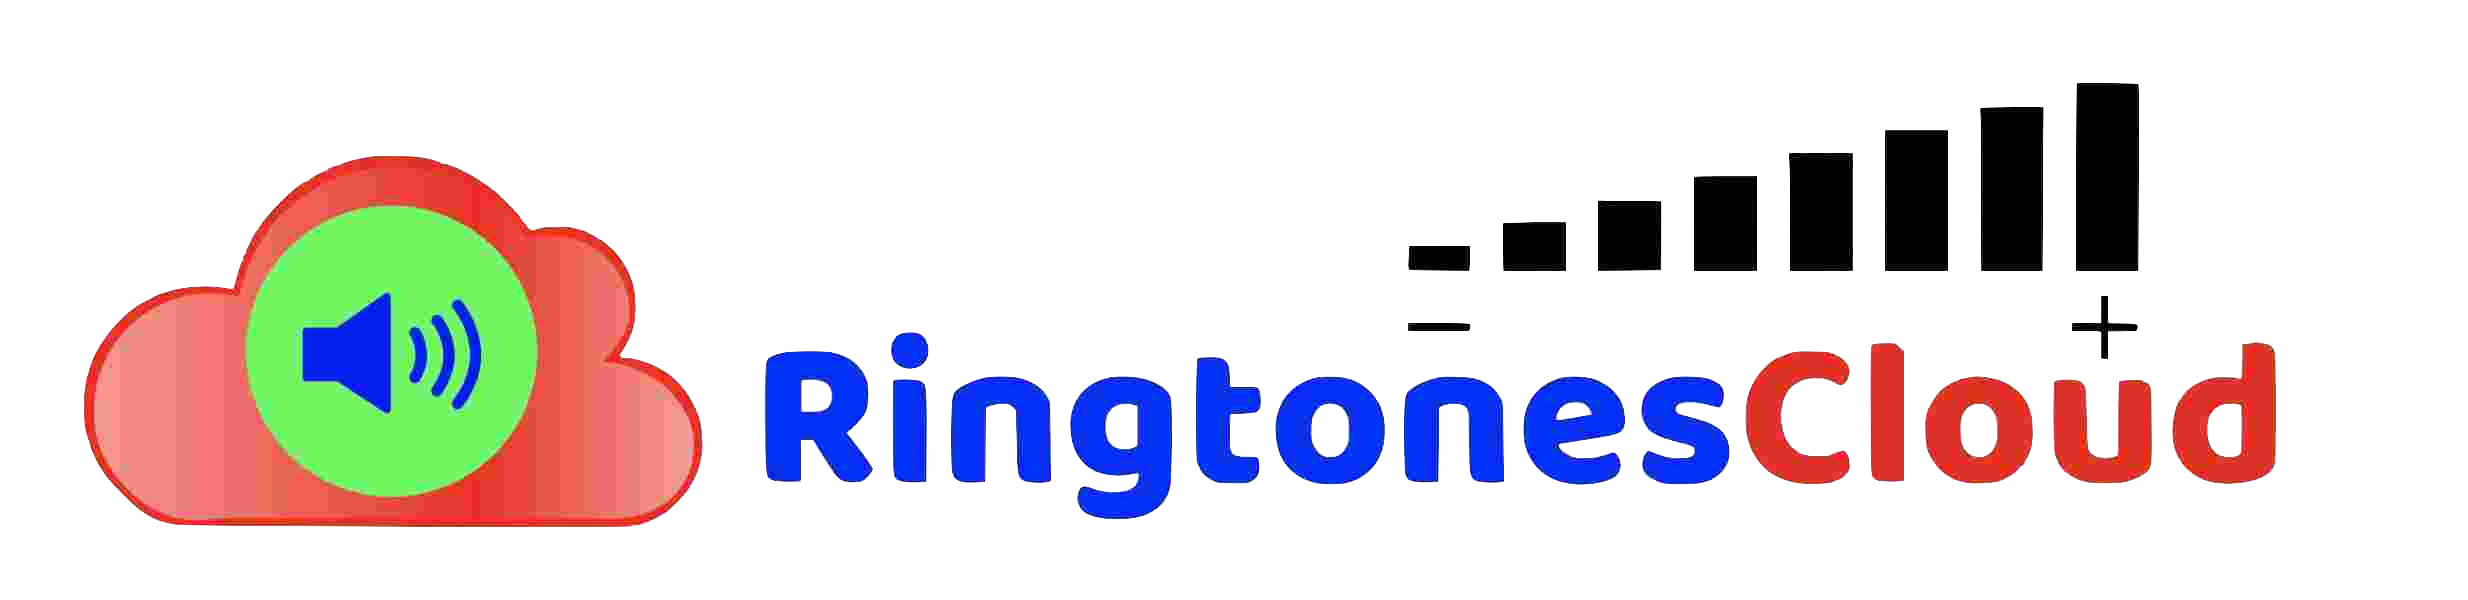 ringtones-logo